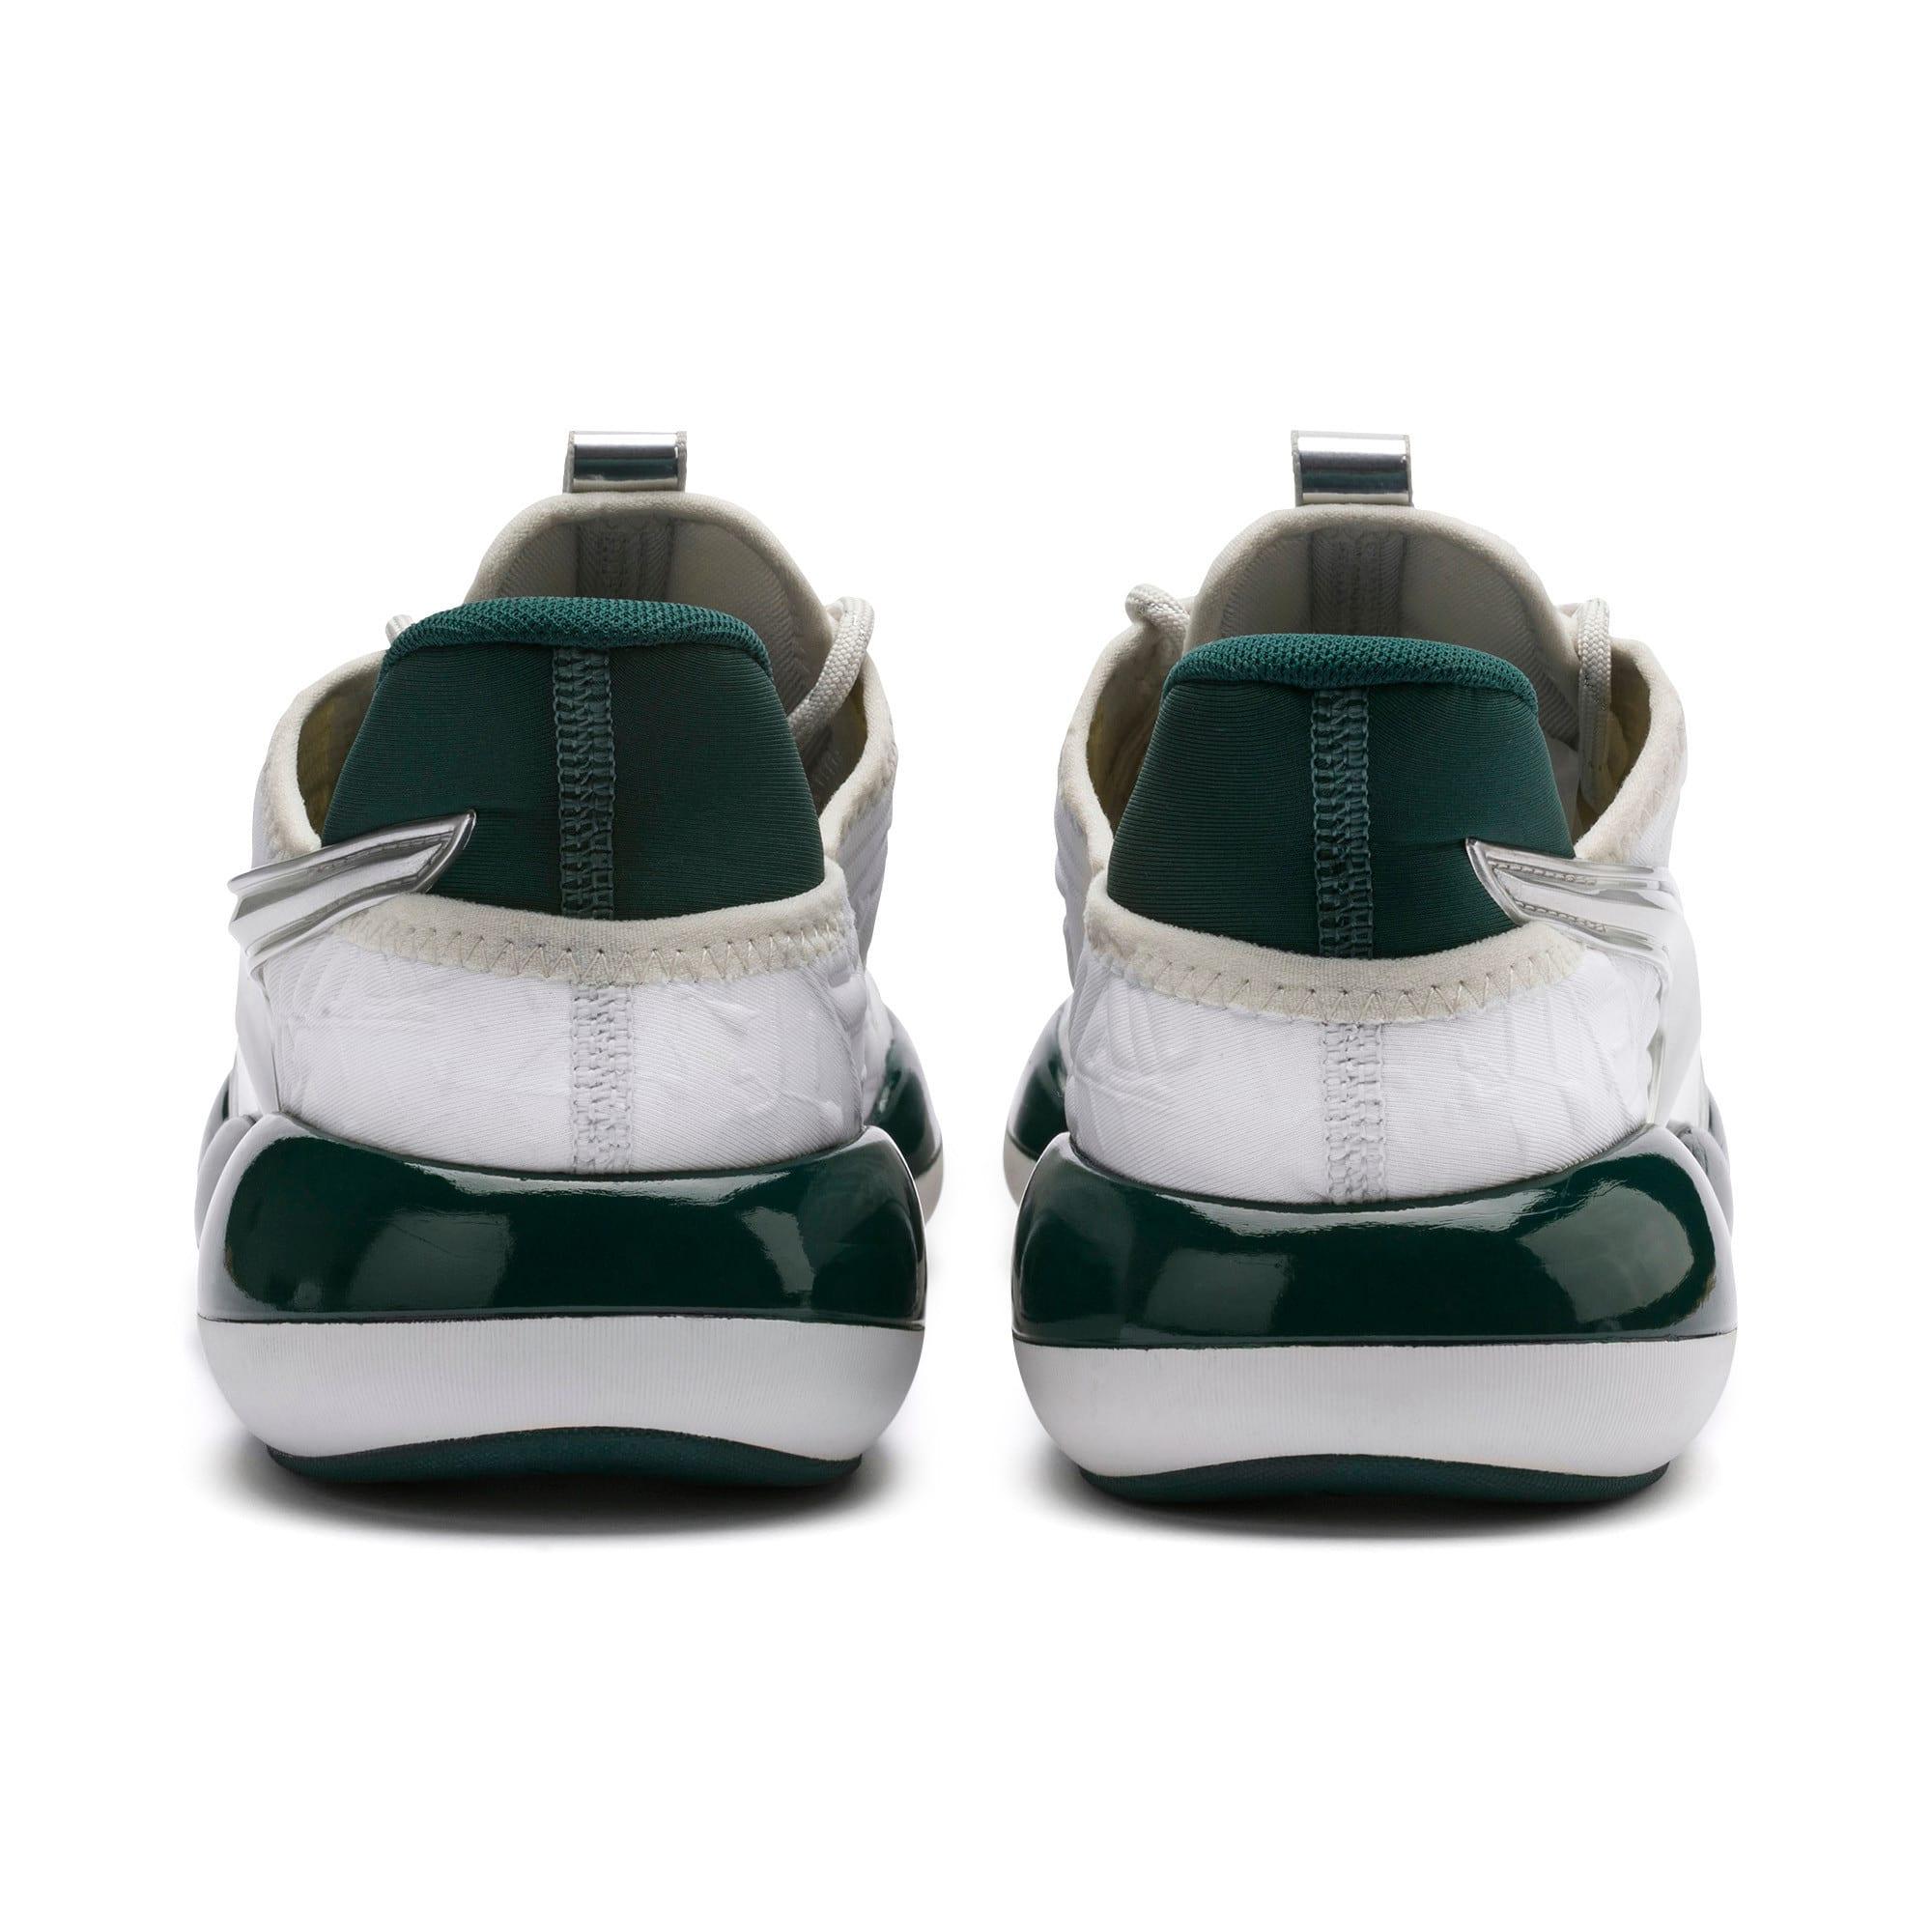 Miniatura 4 de Zapatos deentrenamiento Mode XT Trailblazer para mujer, Puma White-Ponderosa Pine, mediano